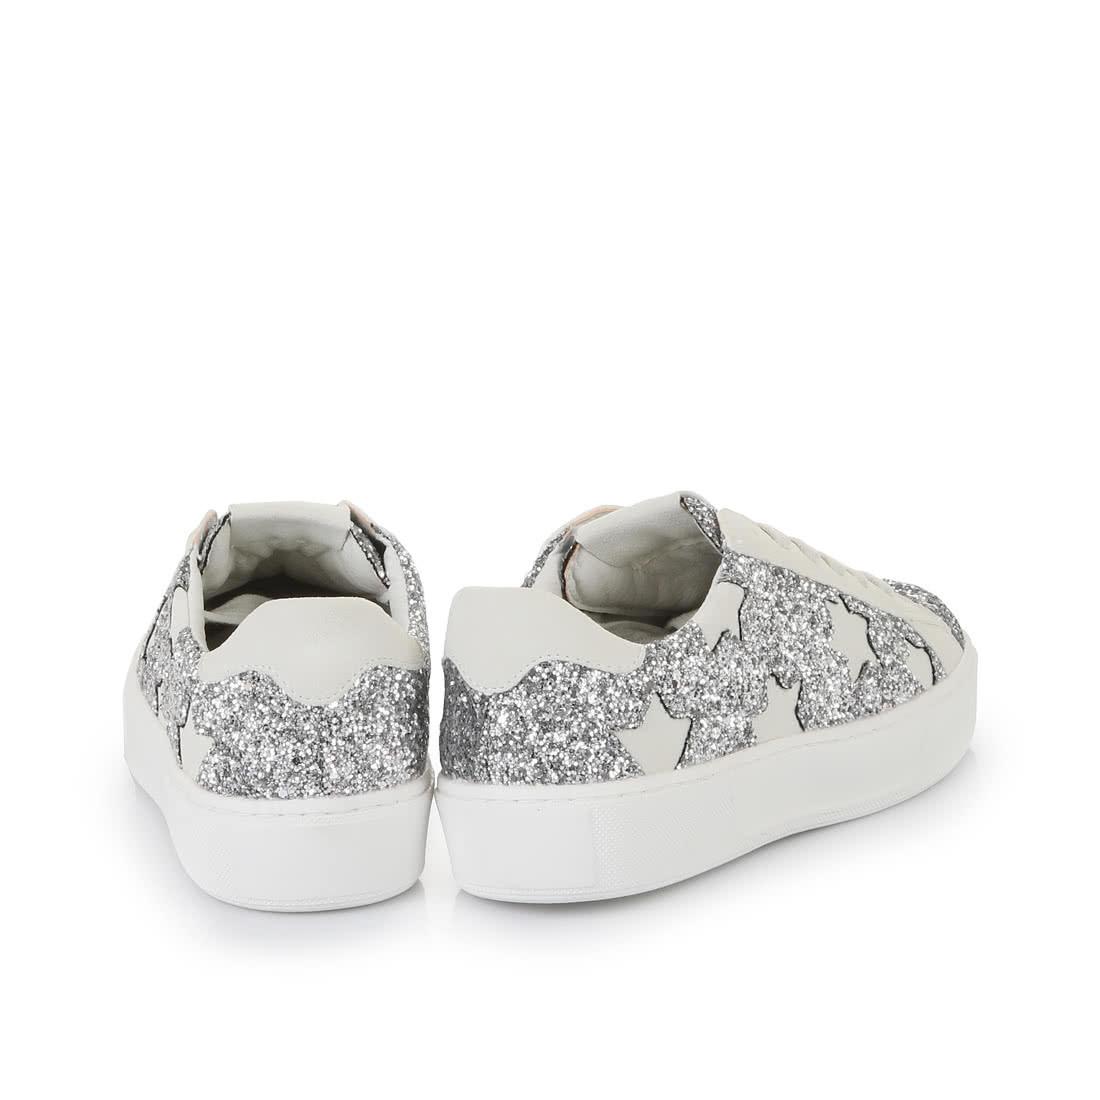 new product 12277 f0d95 Buffalo Plateau-Sneaker in weiß/silber glitzer online kaufen ...